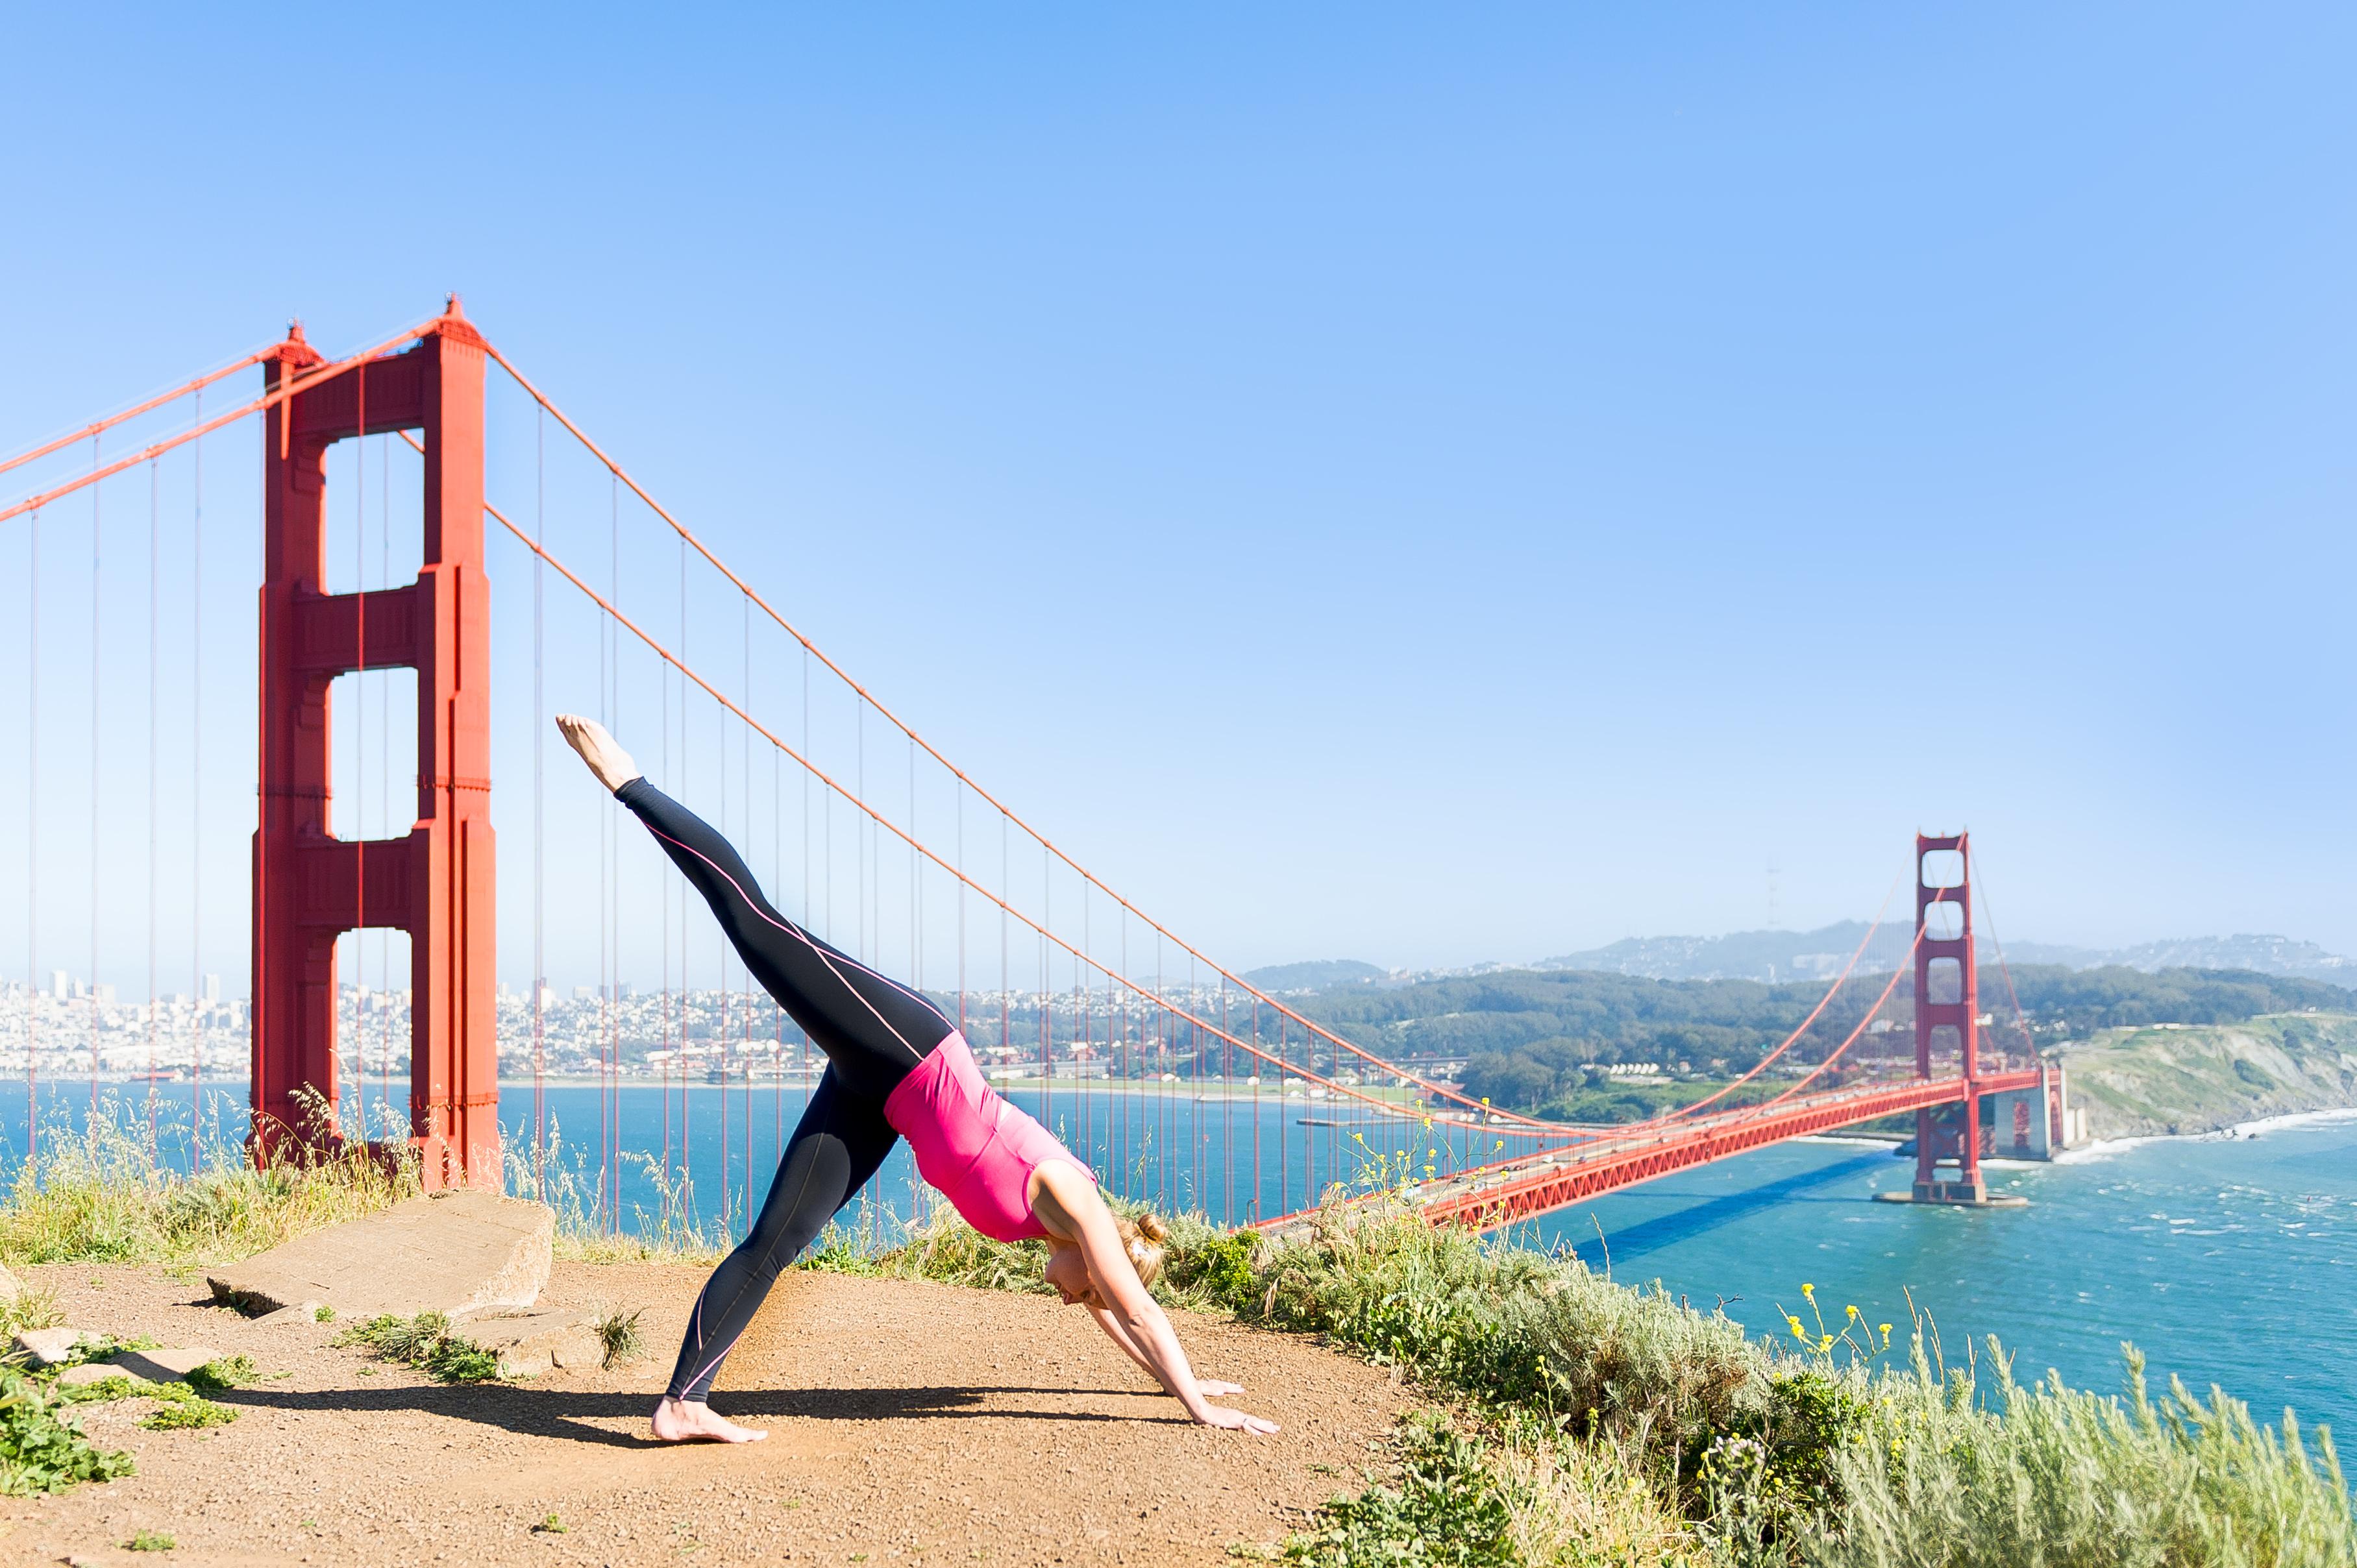 San Francisco, sa baie, ses yogas